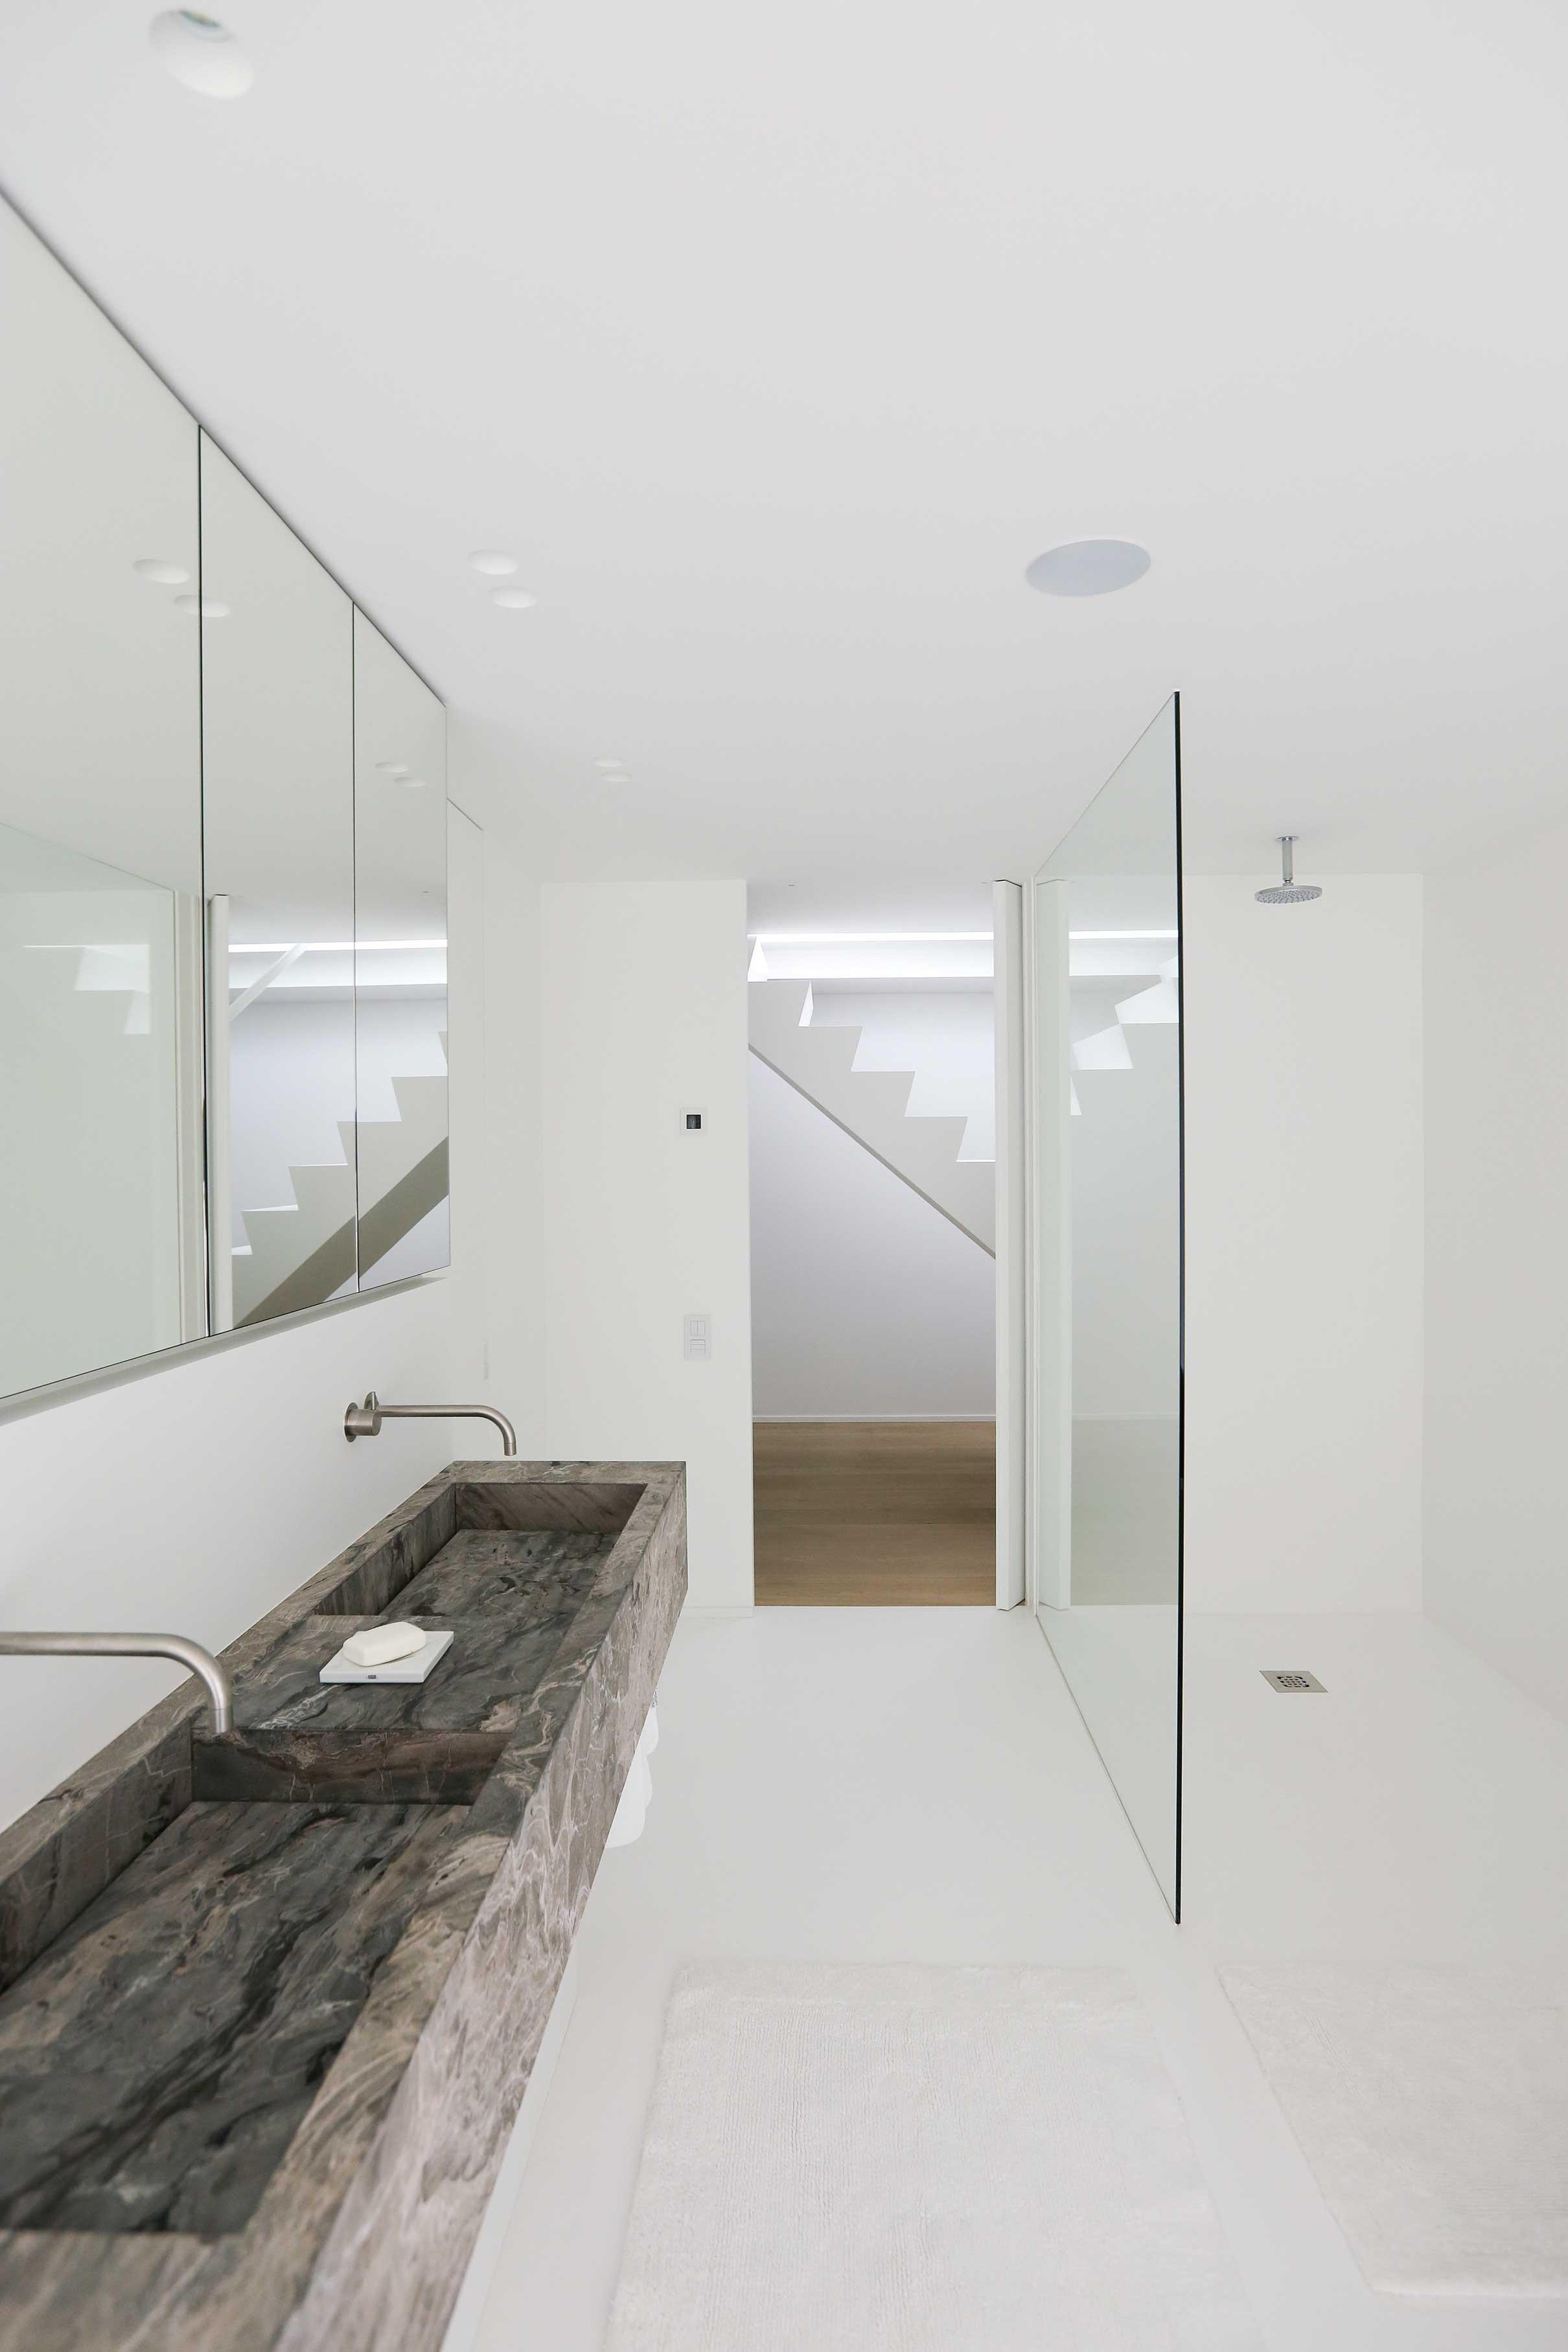 Rietveldprojects.be-ArneJ-duinen-design-architectuur-kust9.jpg